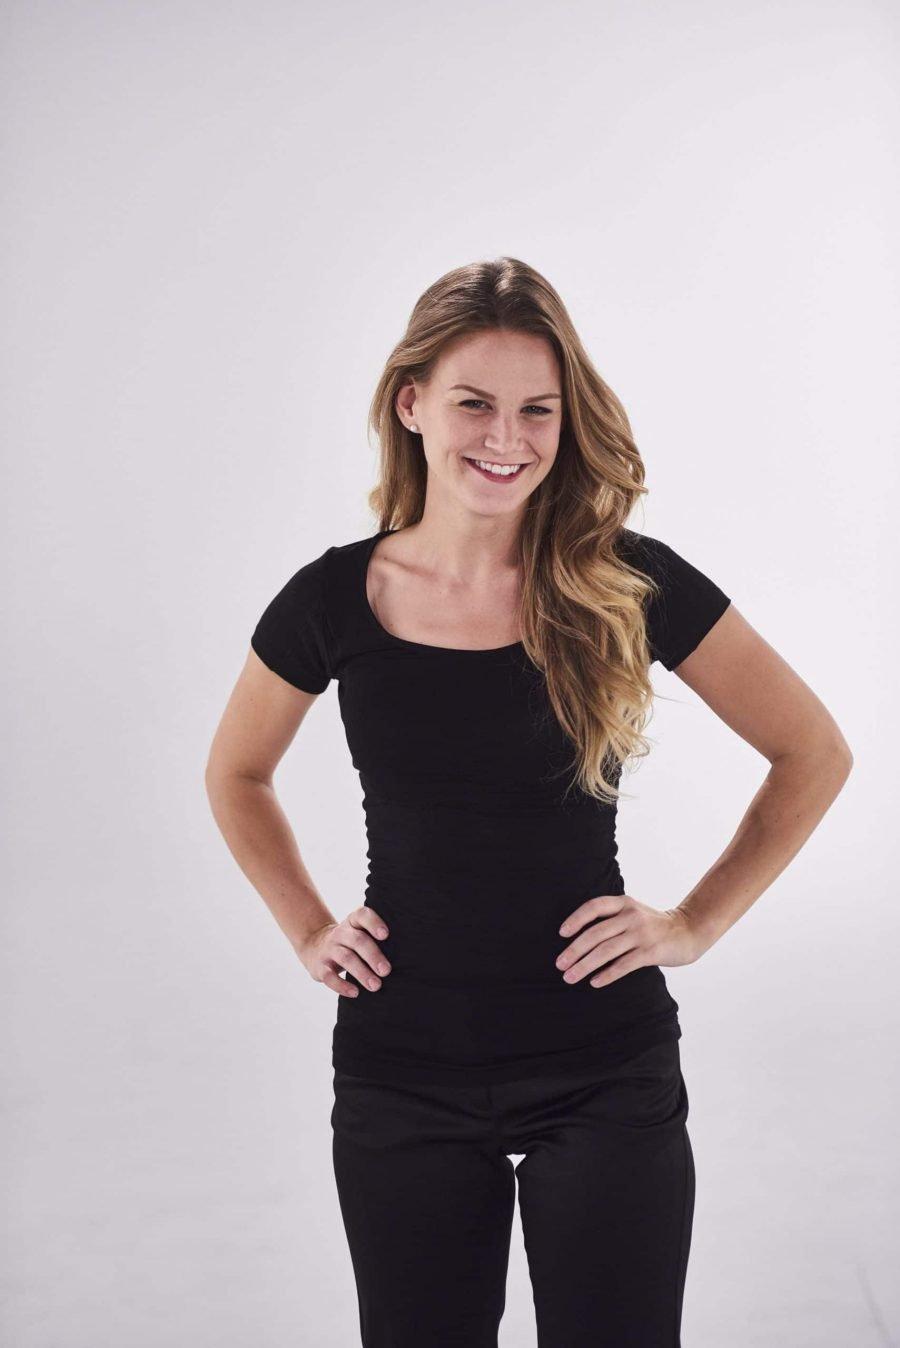 The TopDry Sweatproof Women Scoop Neck Undershirt Black